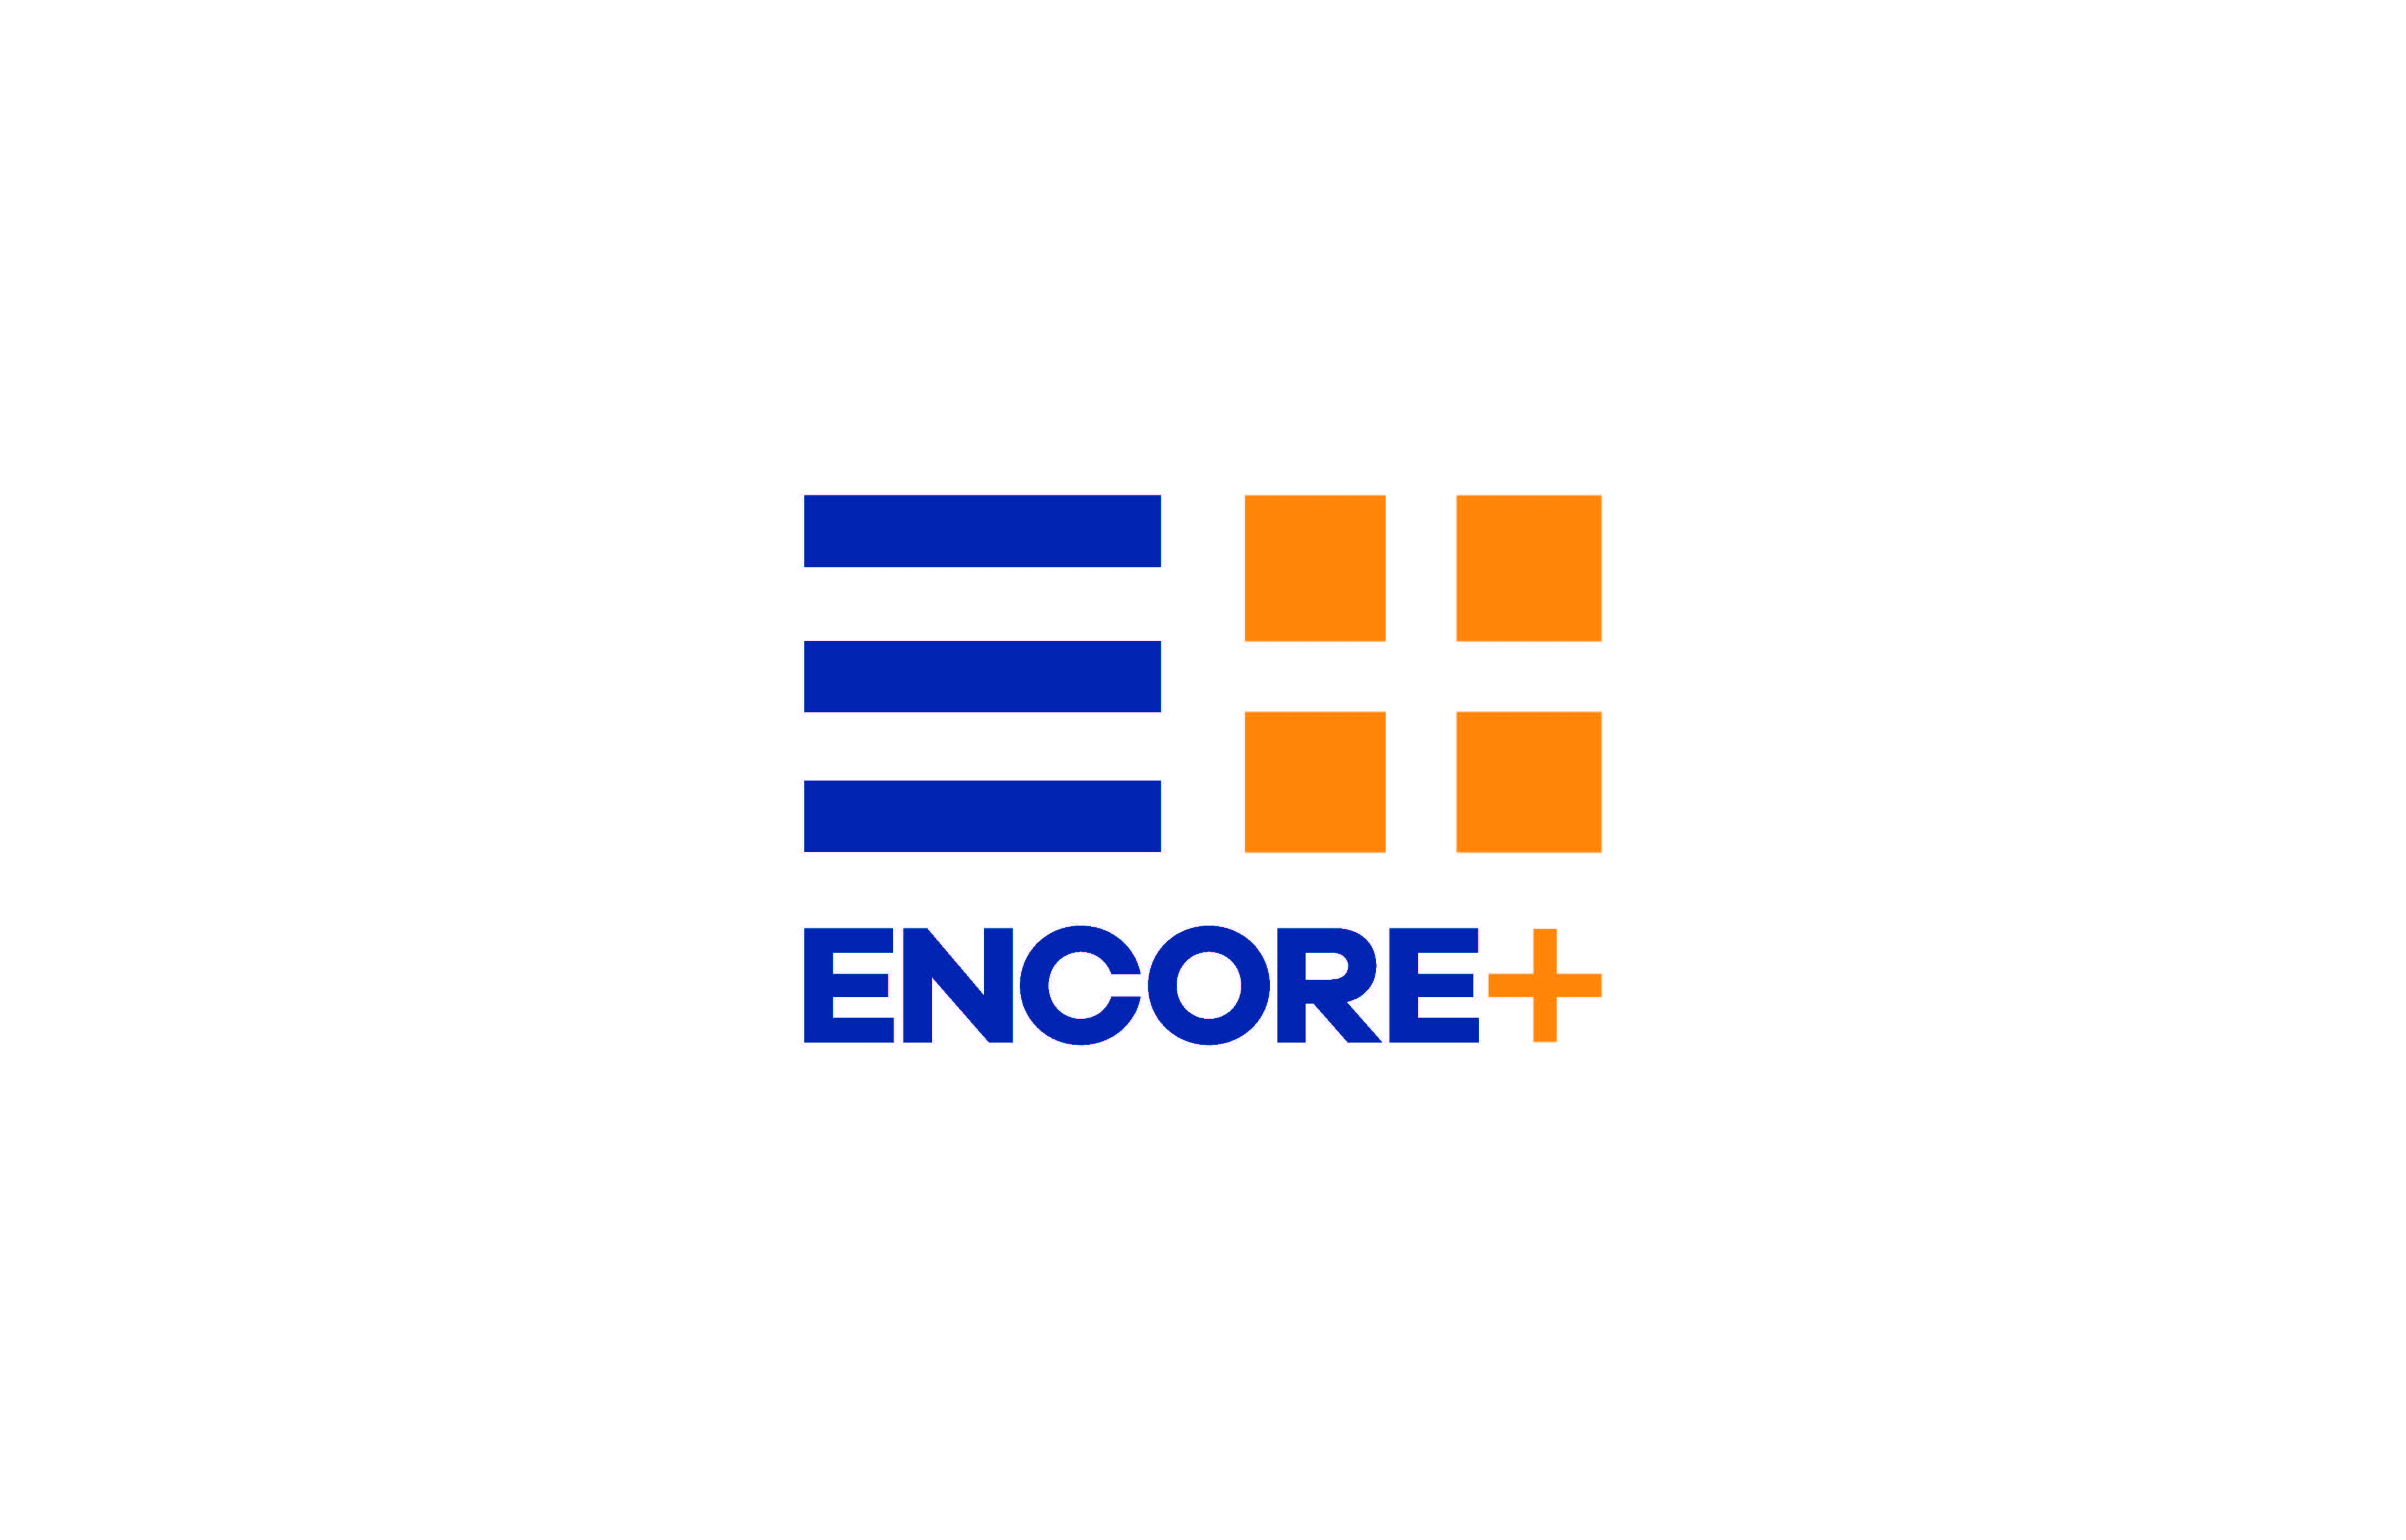 Aviva Investors – Encore + – Studio Beach